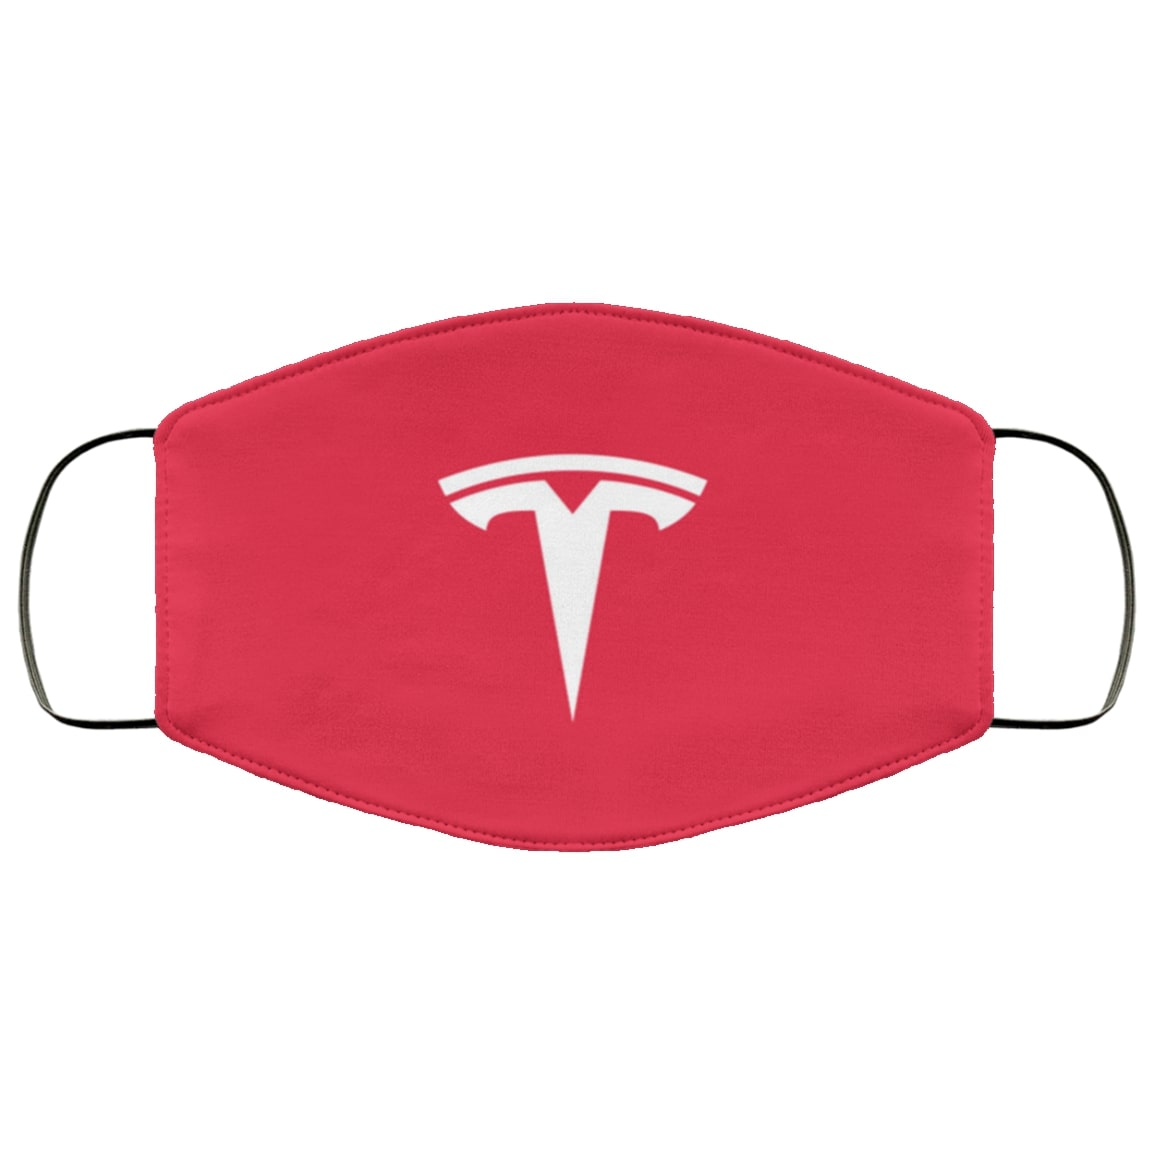 Tesla motors full over printed face mask 4